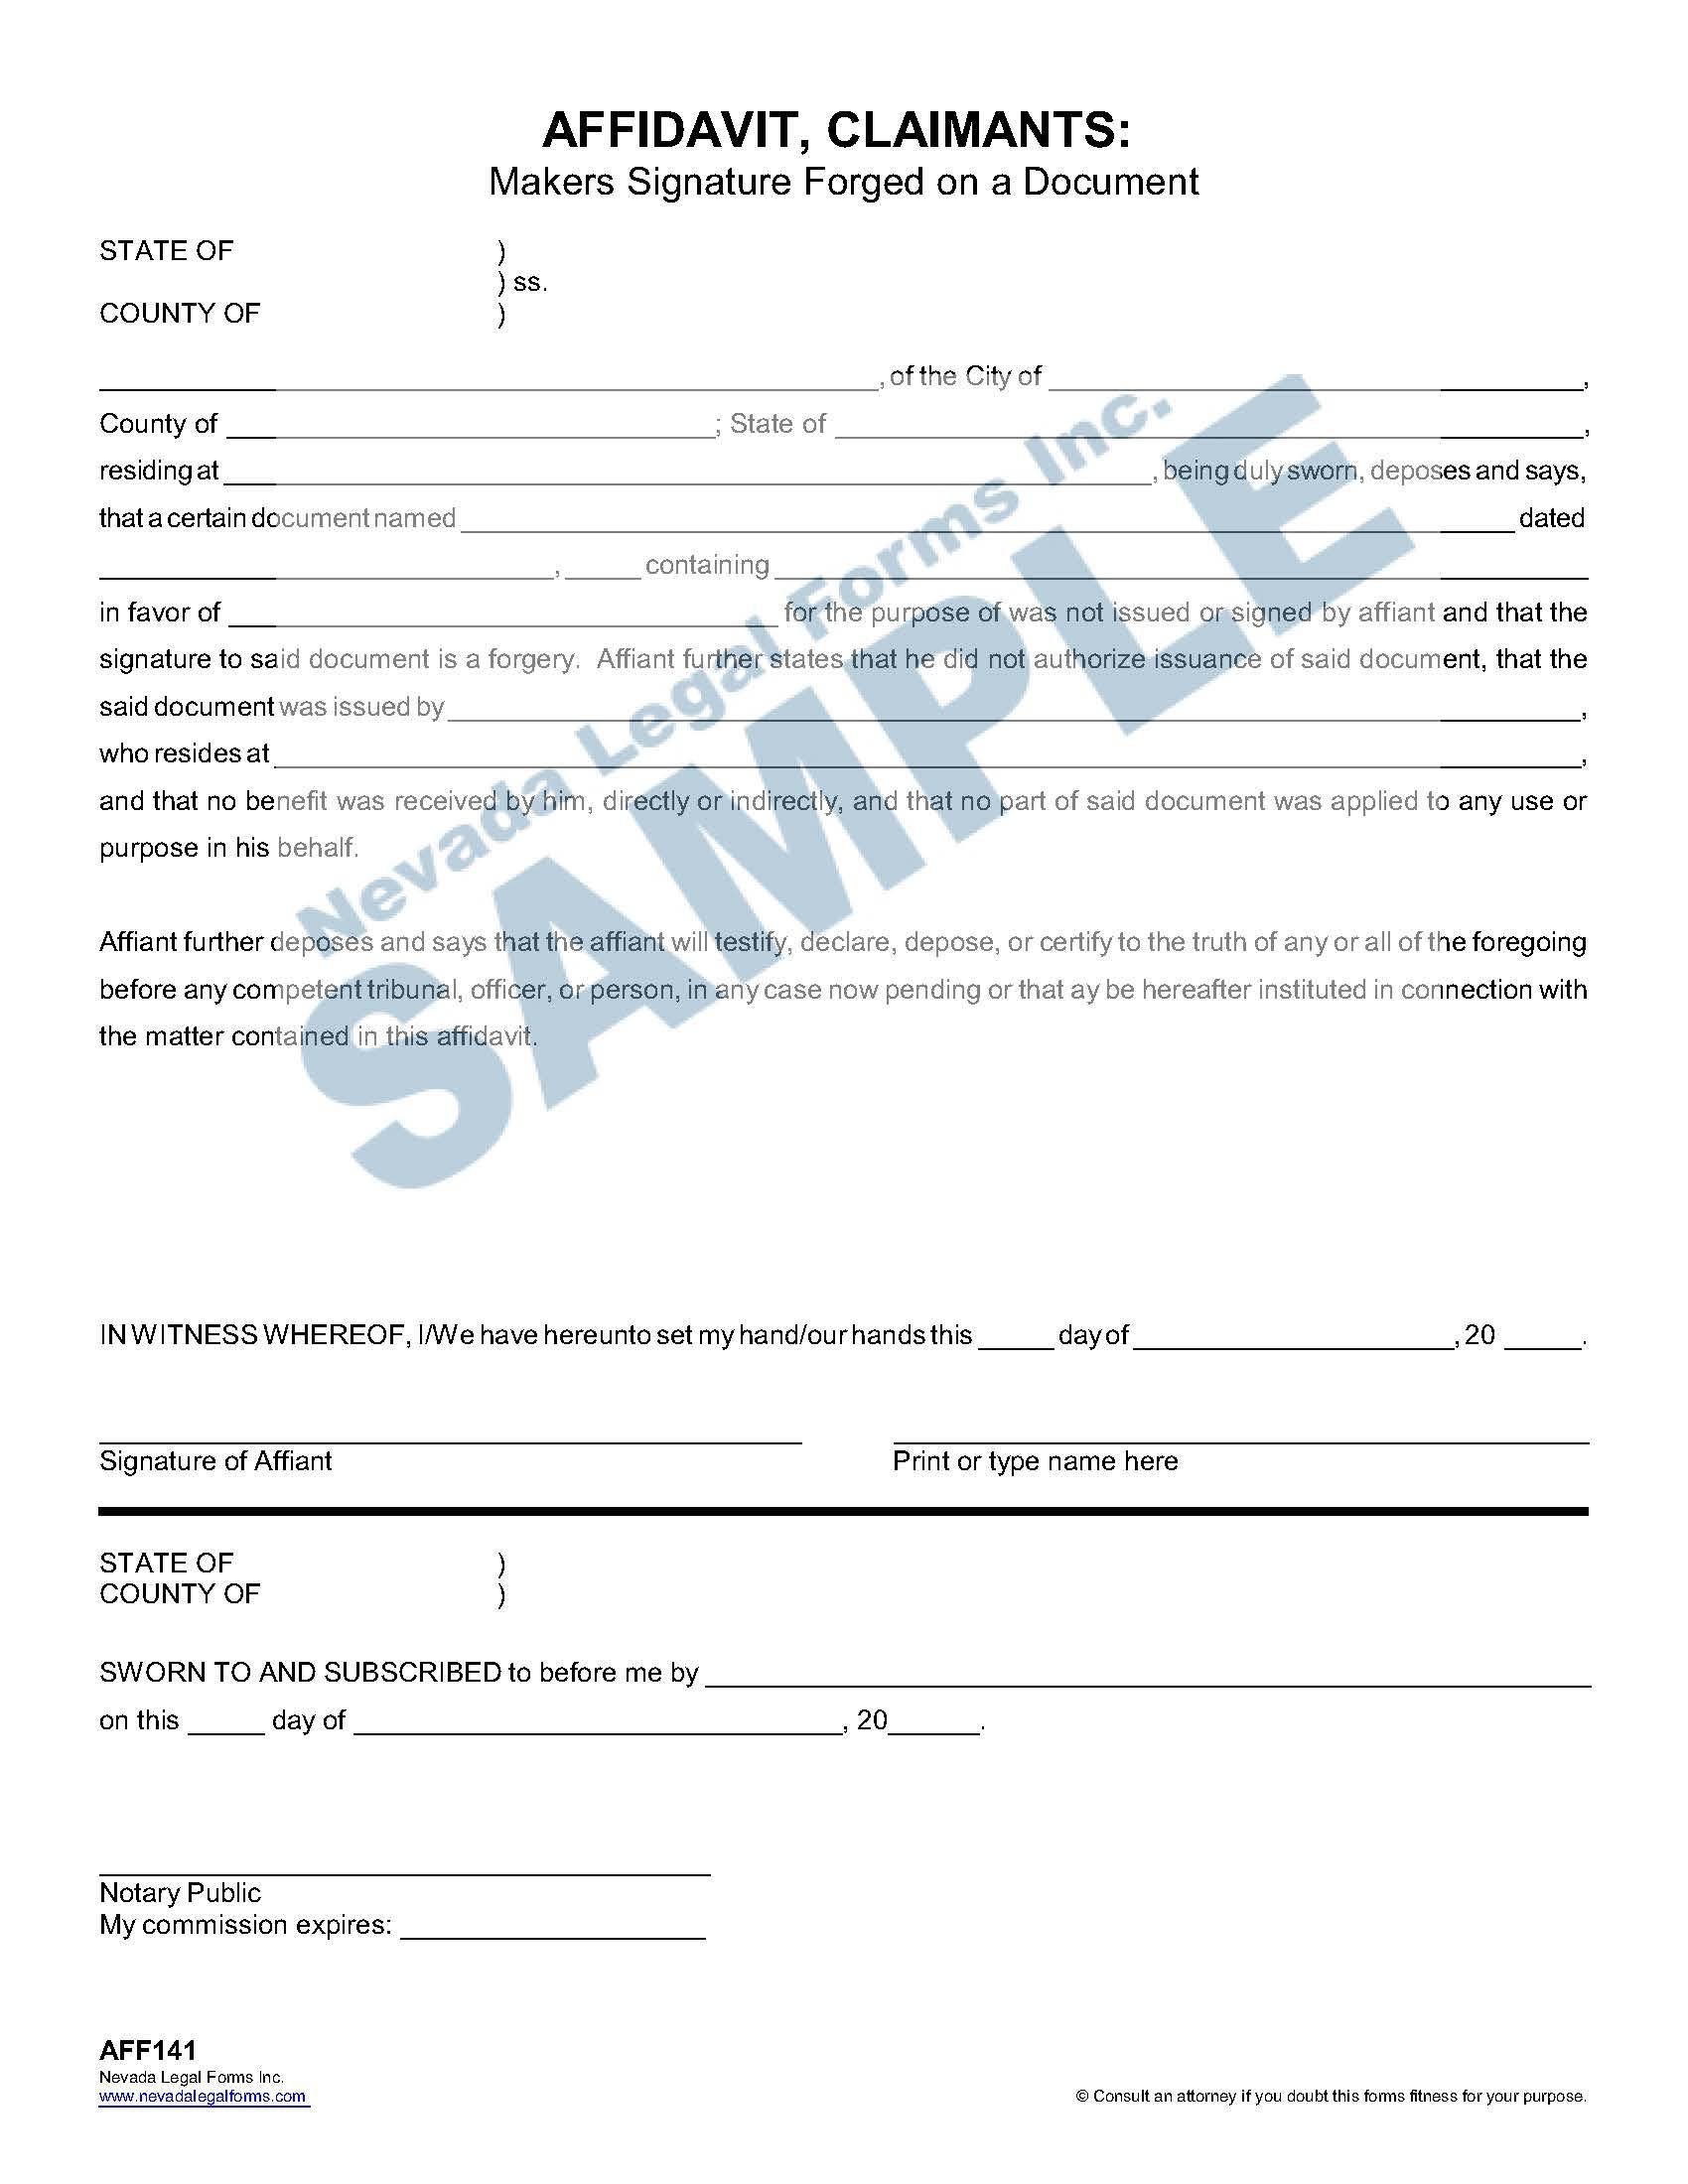 Affidavit Claimants Makers Signature Forged On A